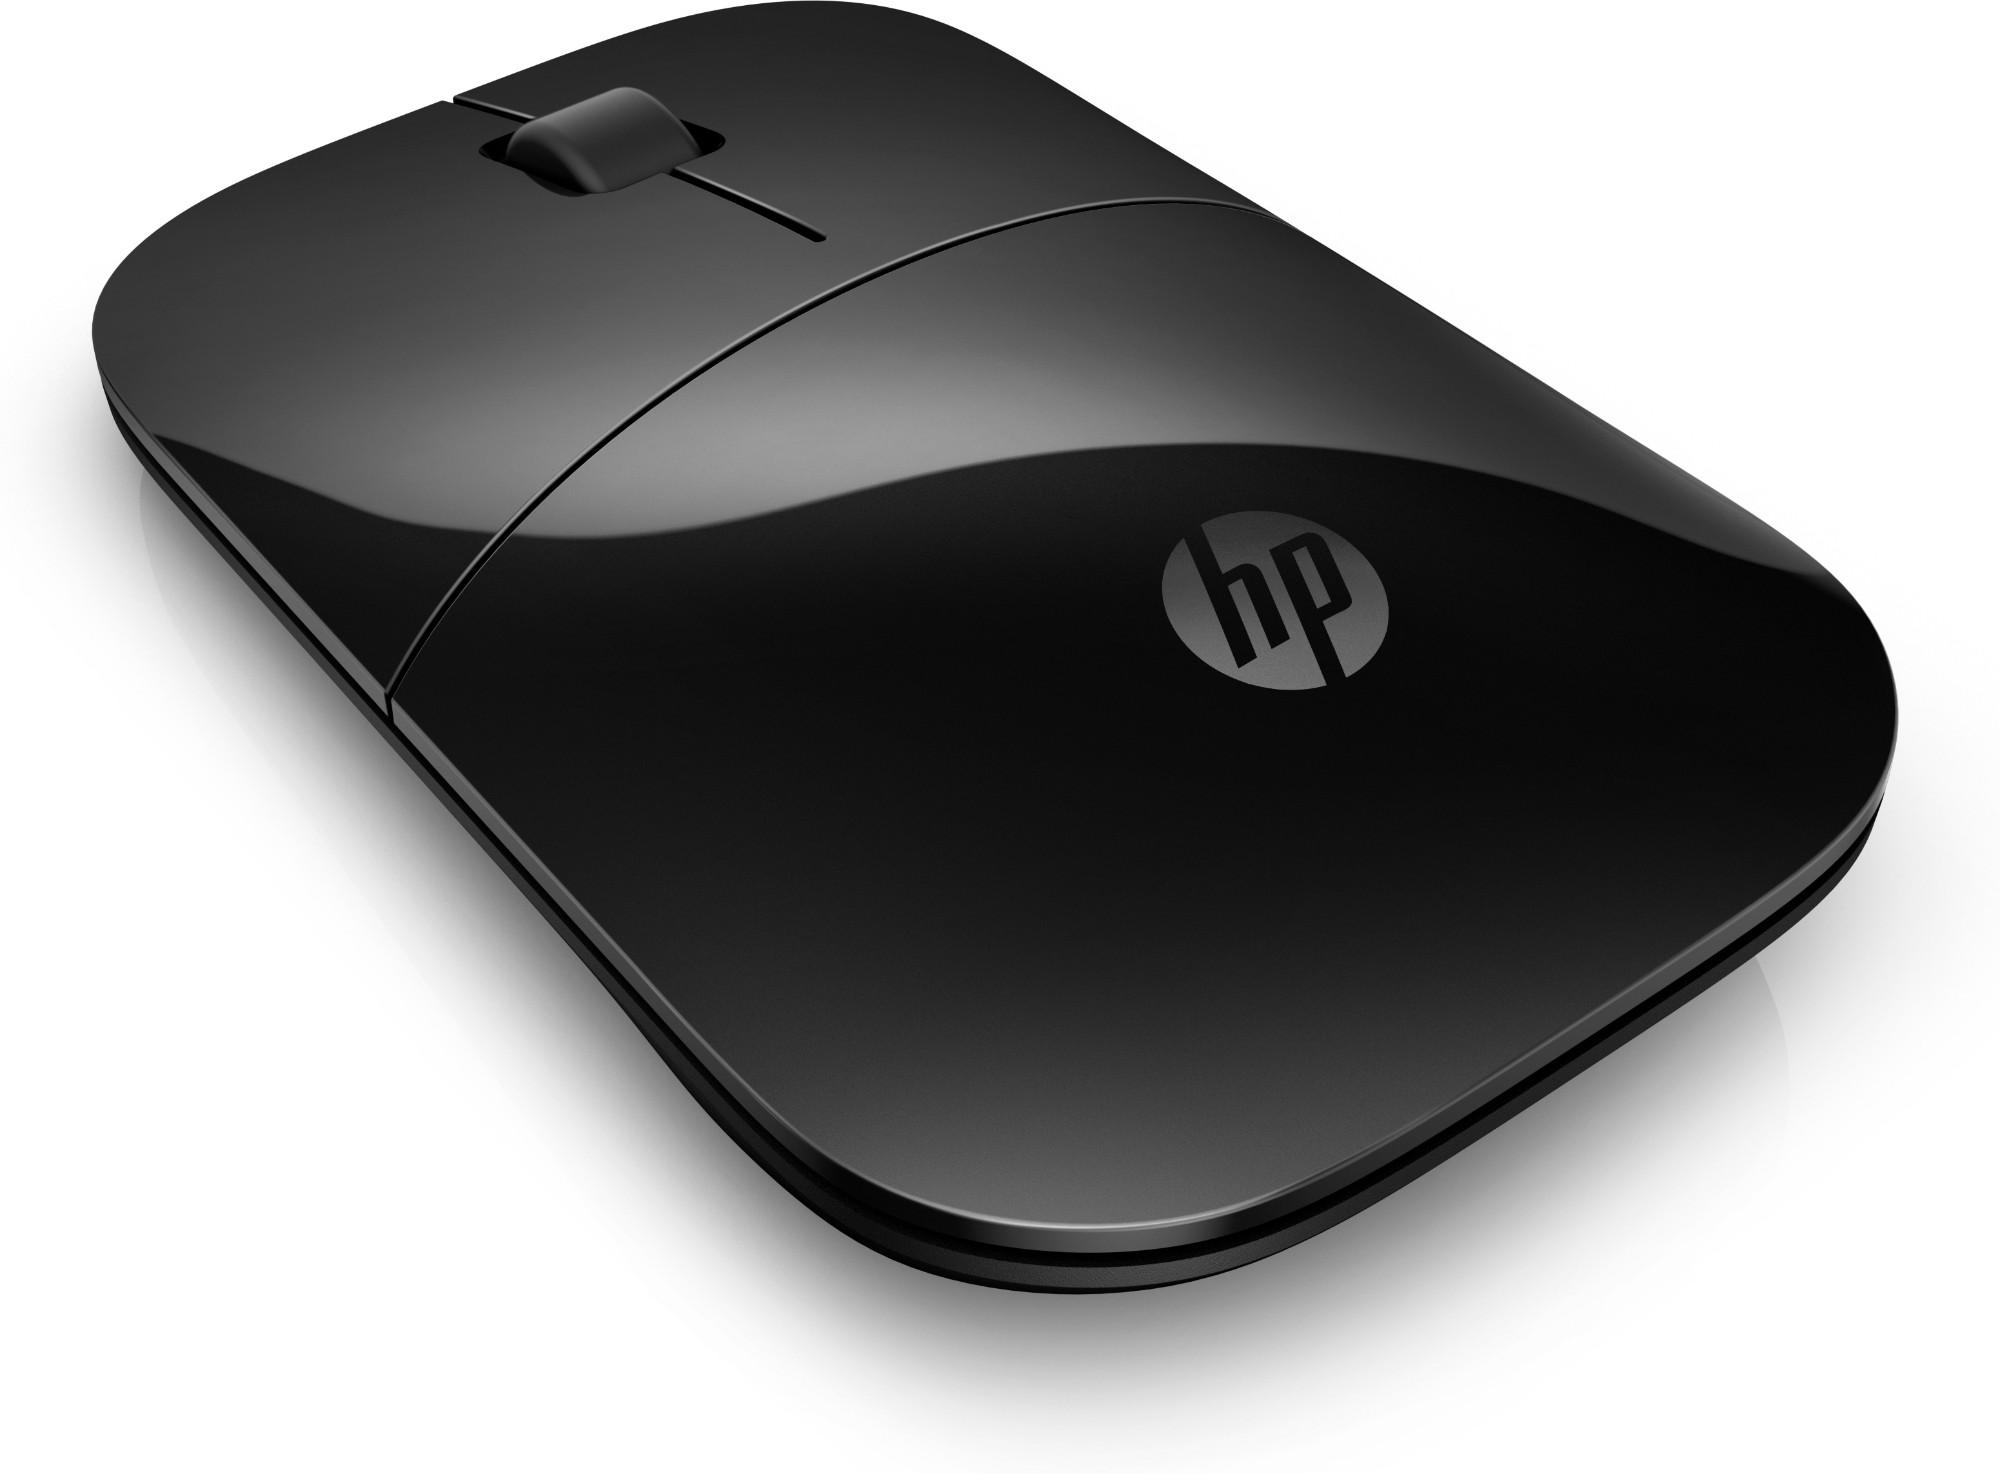 Wireless Mouse Z3700 Black